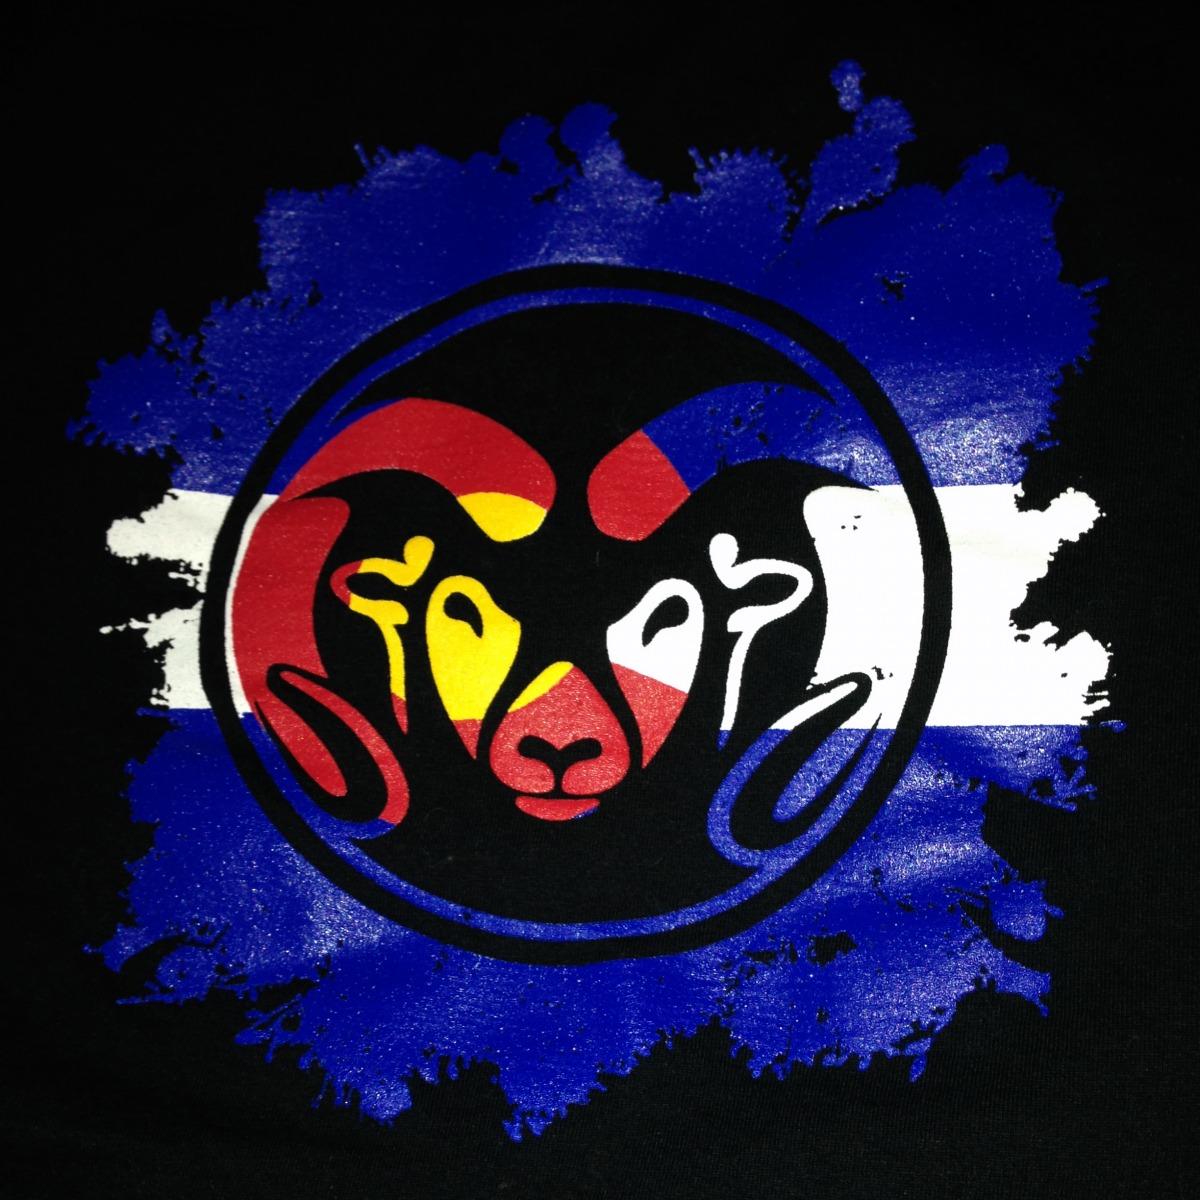 Cru At Colorado State University Get Connected Csu Cru Shirts